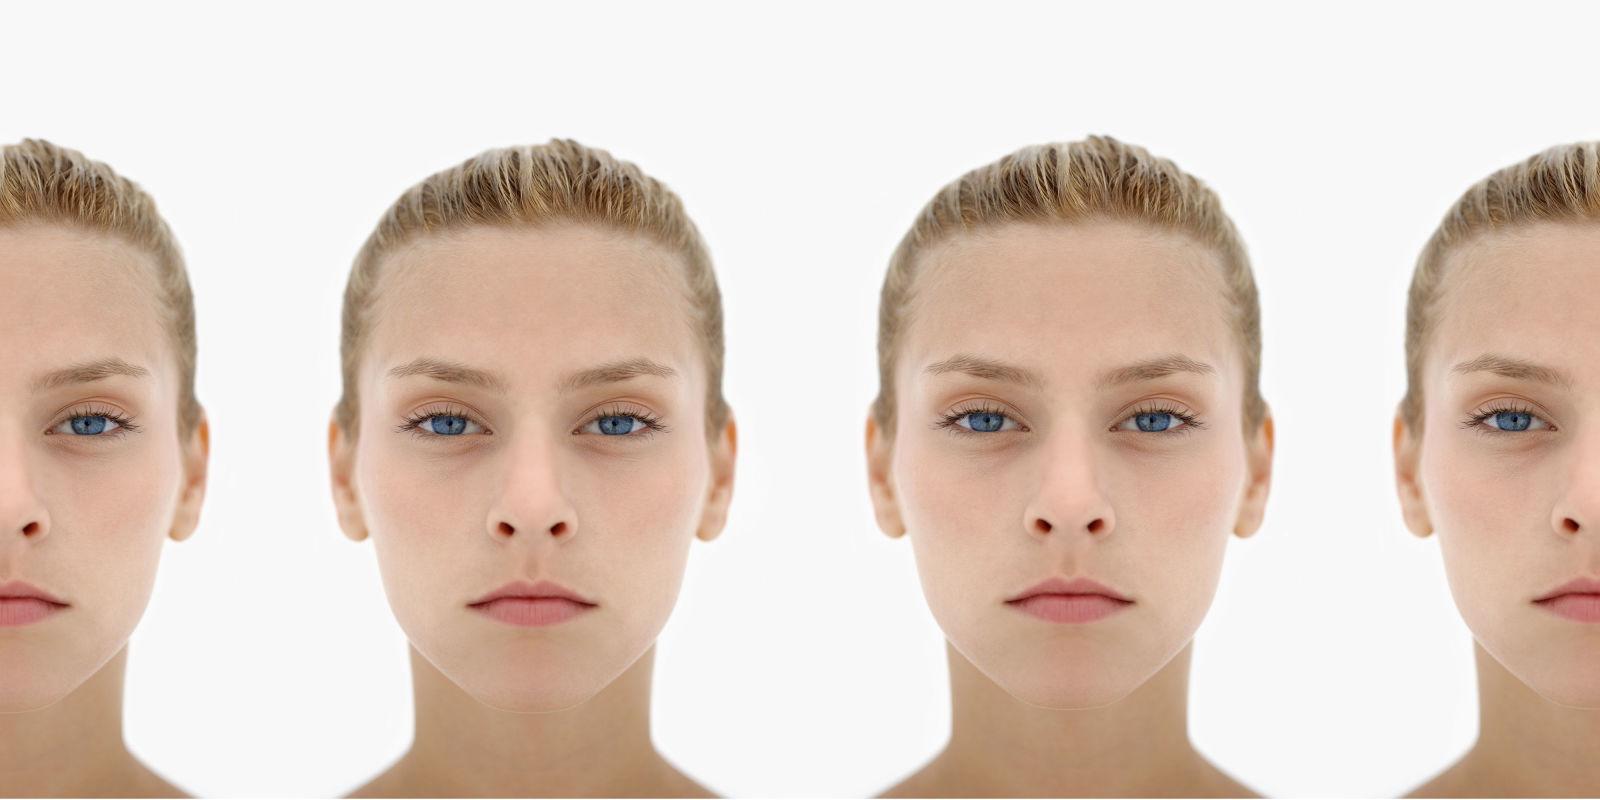 Human clone